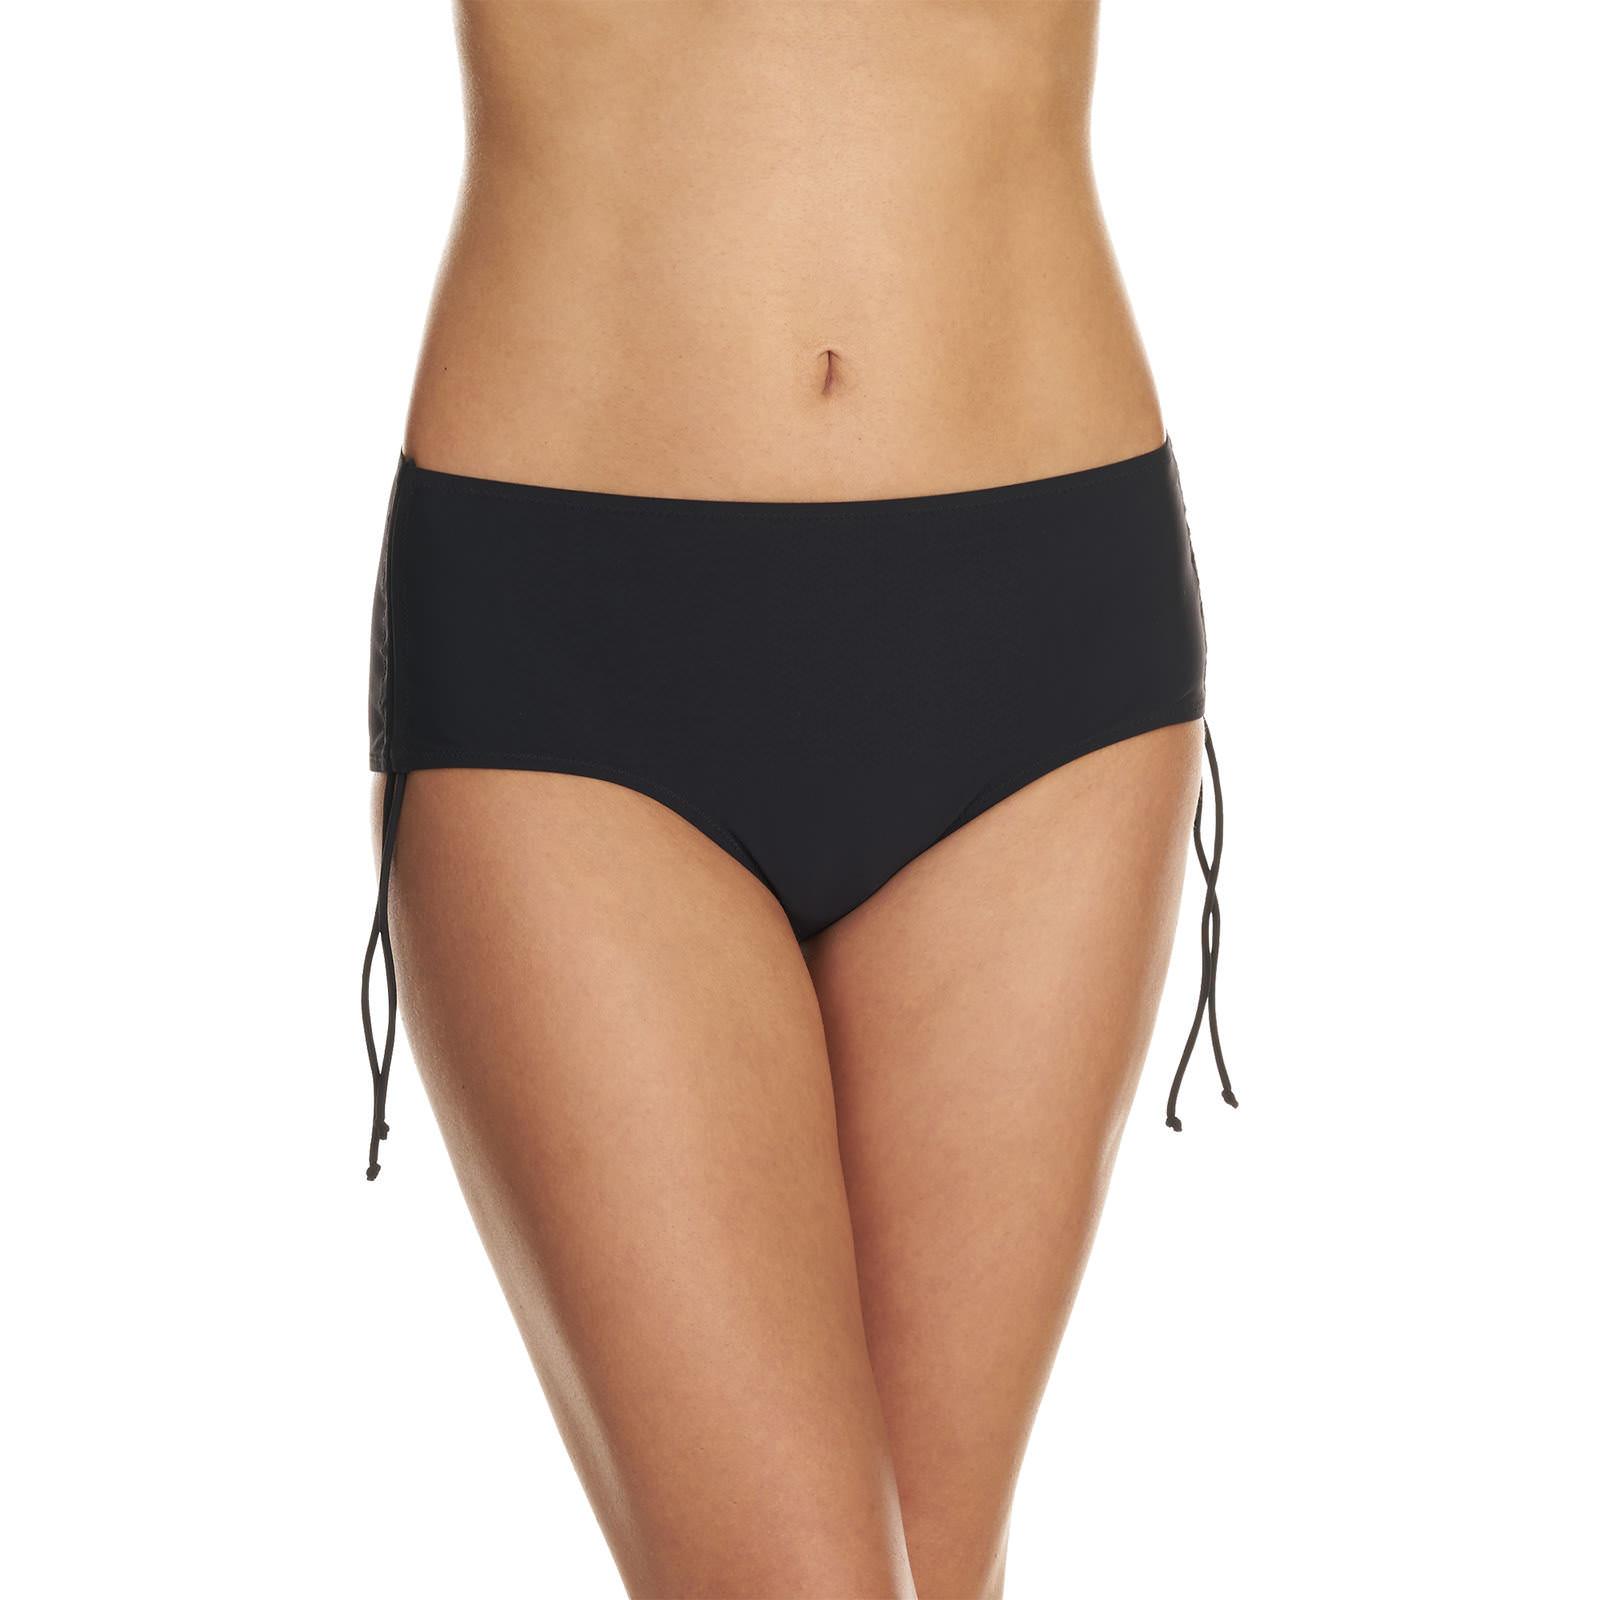 bikini unterteil island hopping in schwarz bademode bikini hose slip. Black Bedroom Furniture Sets. Home Design Ideas